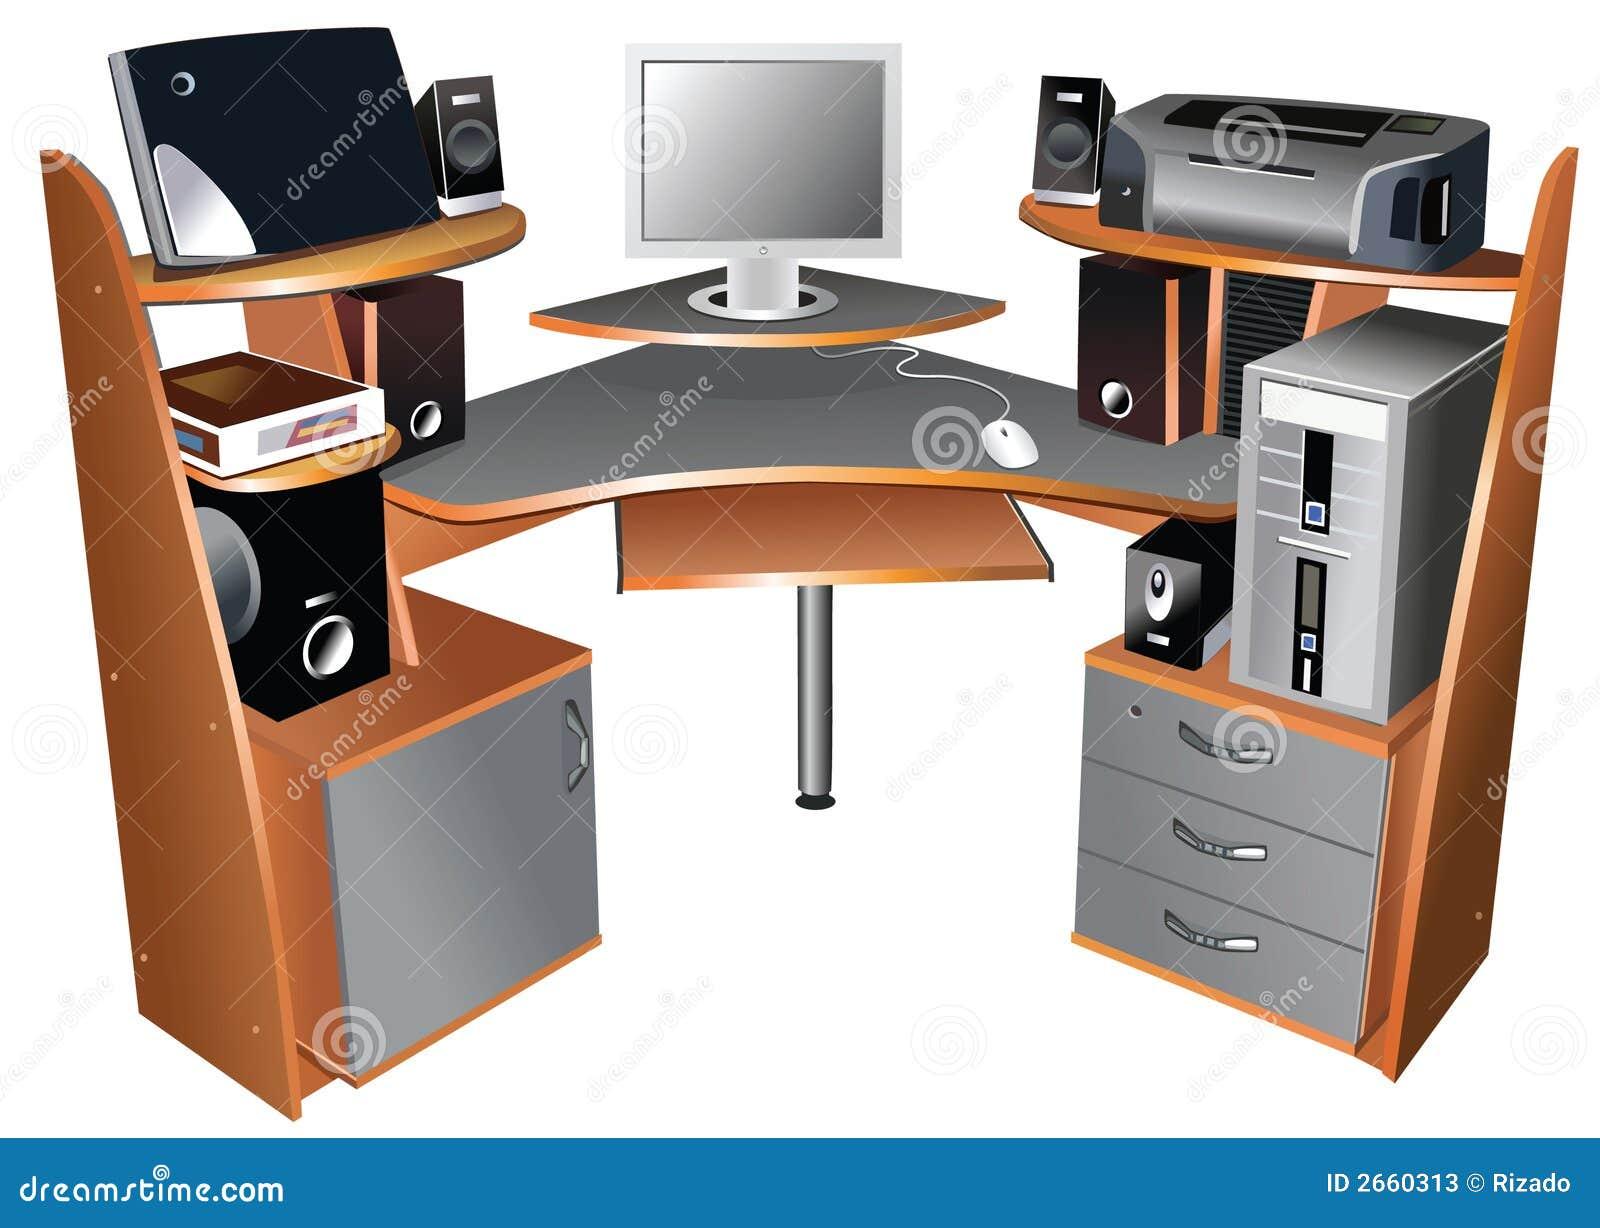 table d 39 ordinateur photos stock image 2660313. Black Bedroom Furniture Sets. Home Design Ideas